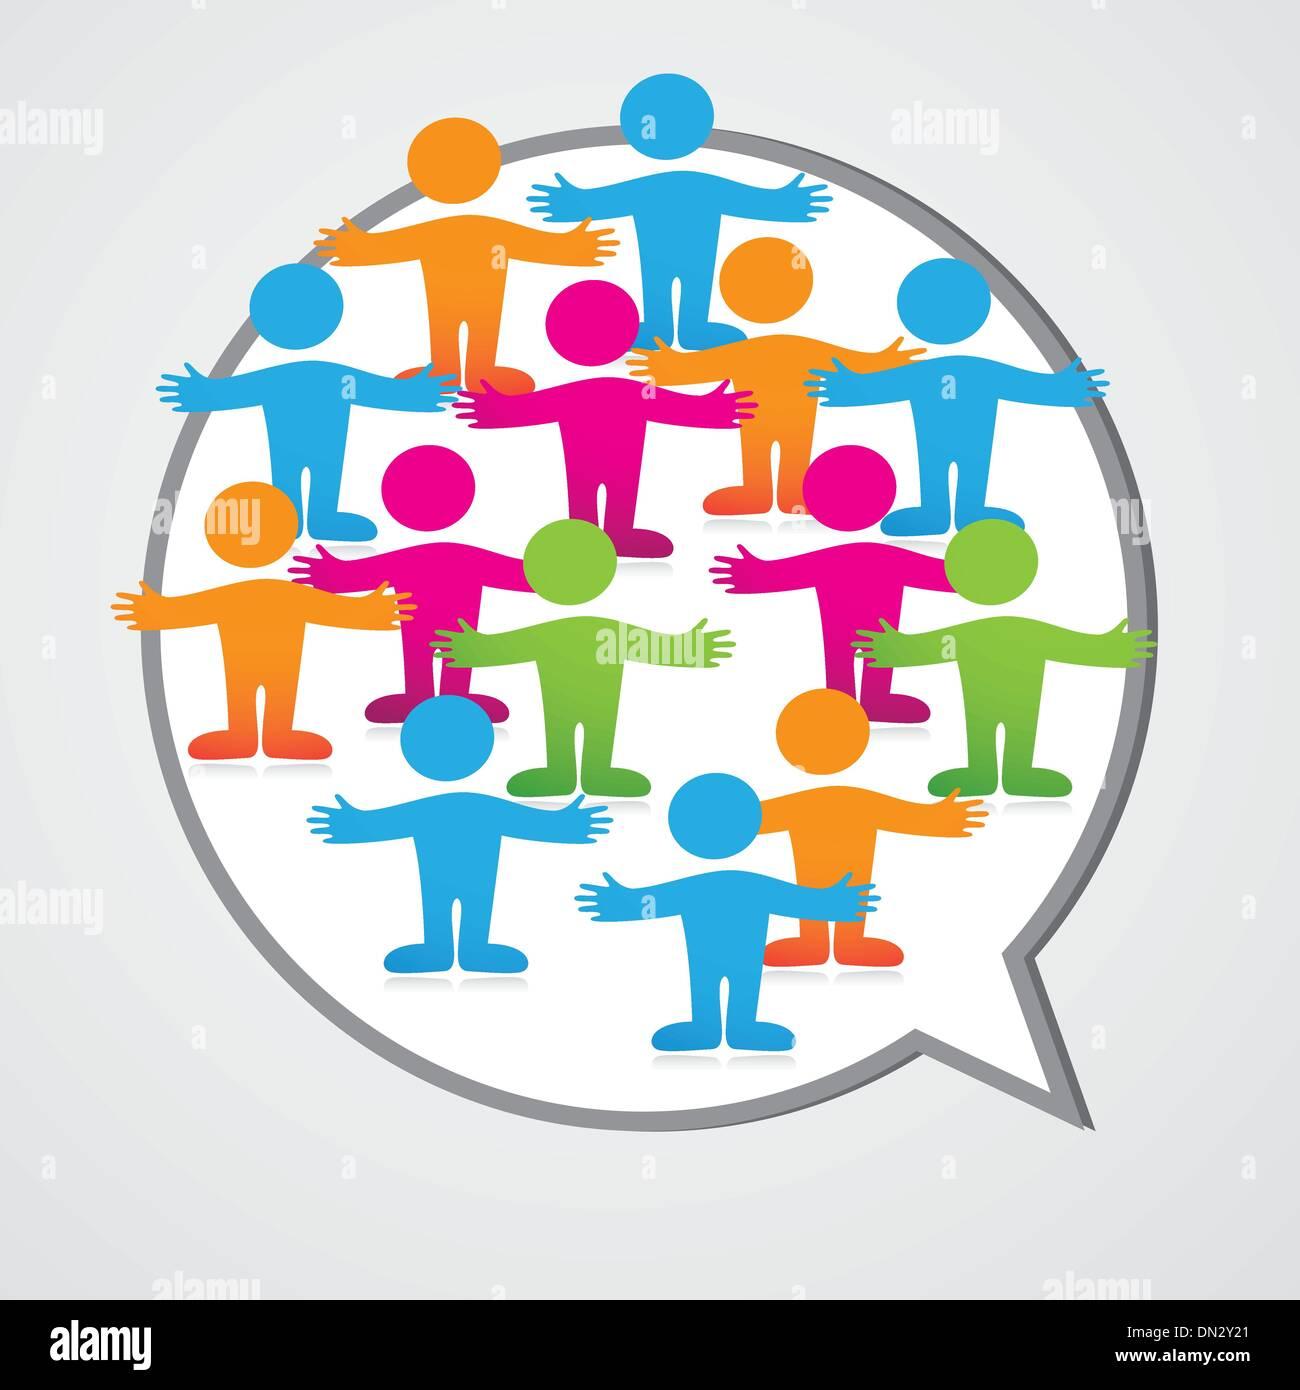 Social-media-people-inner-circle-Speech-Bubble - Stock Image